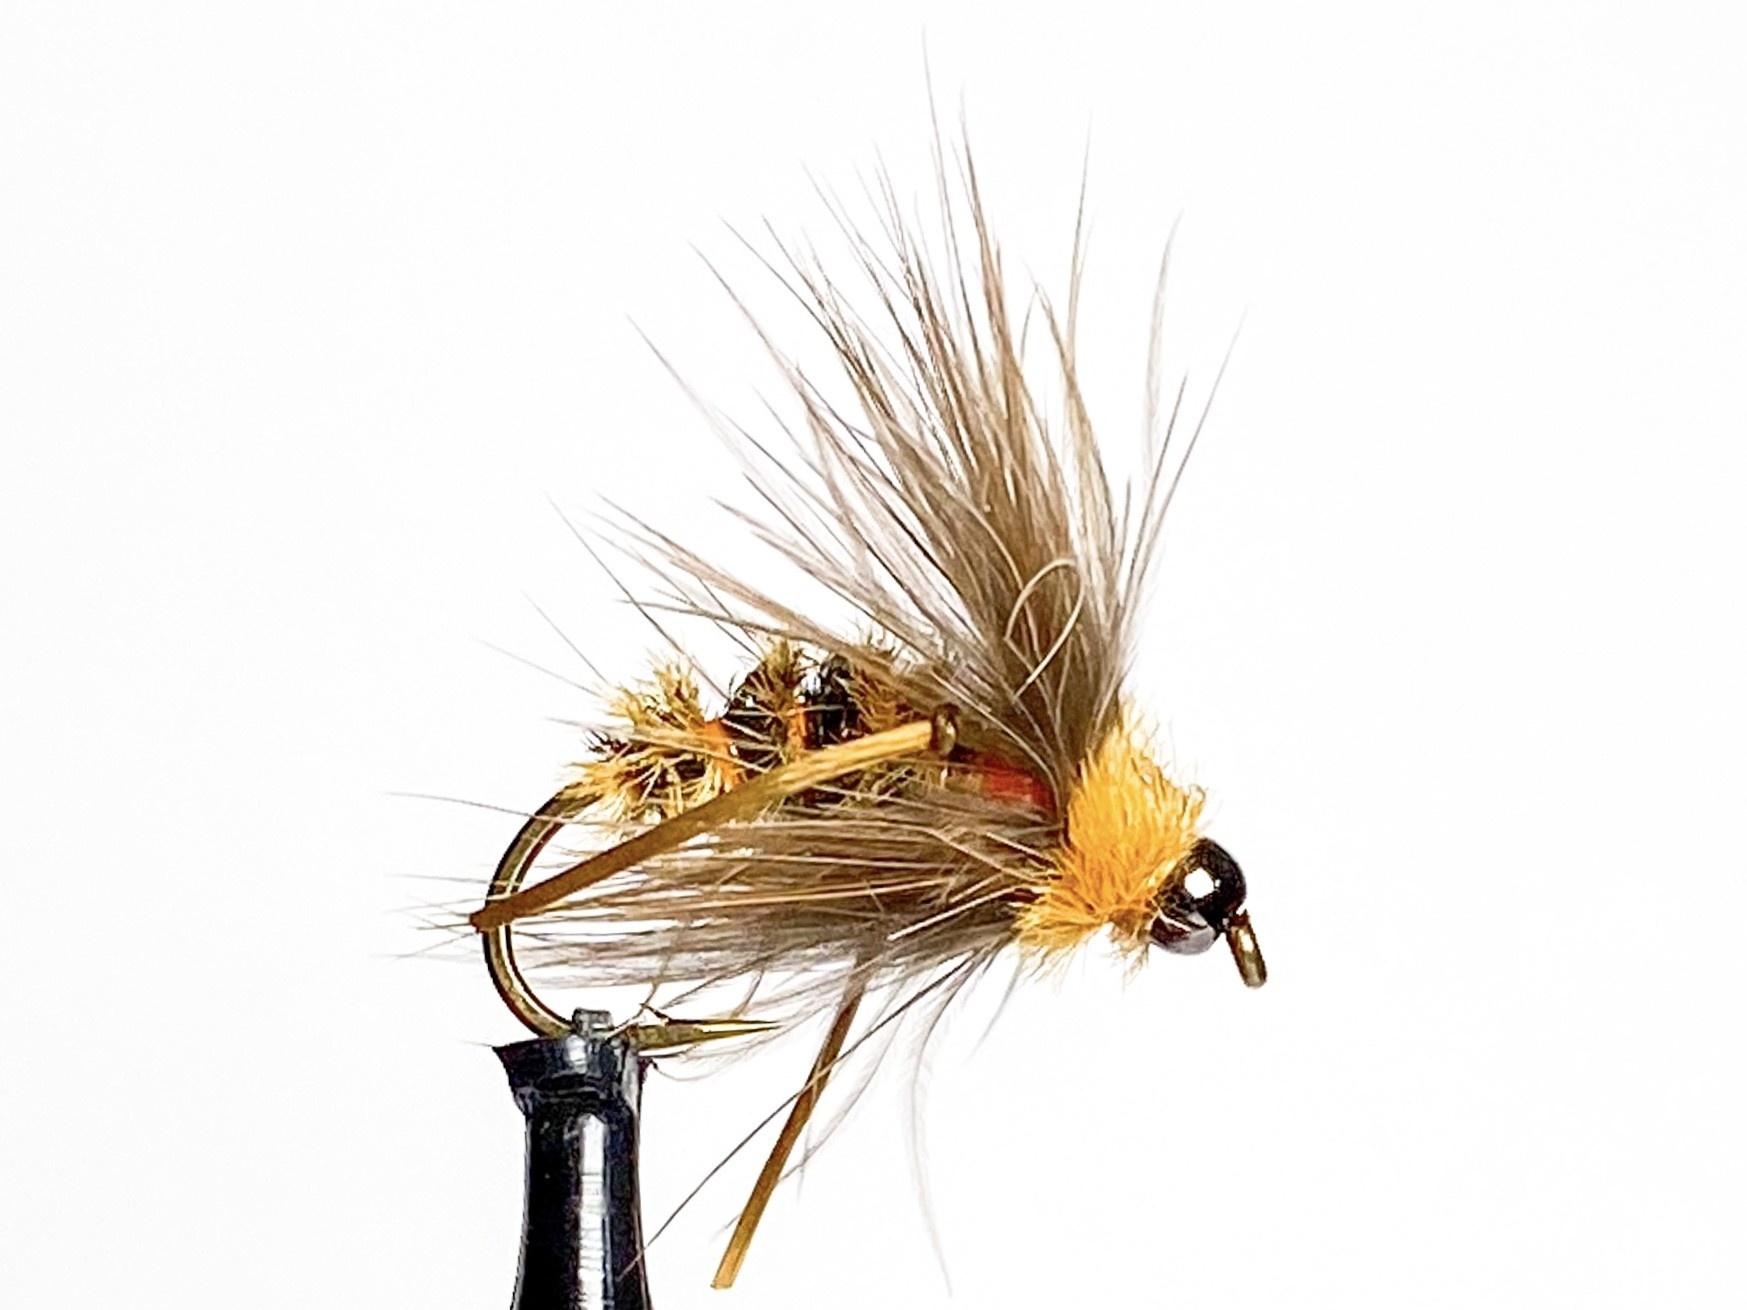 Catch Flies October Caddis Pupa size 10